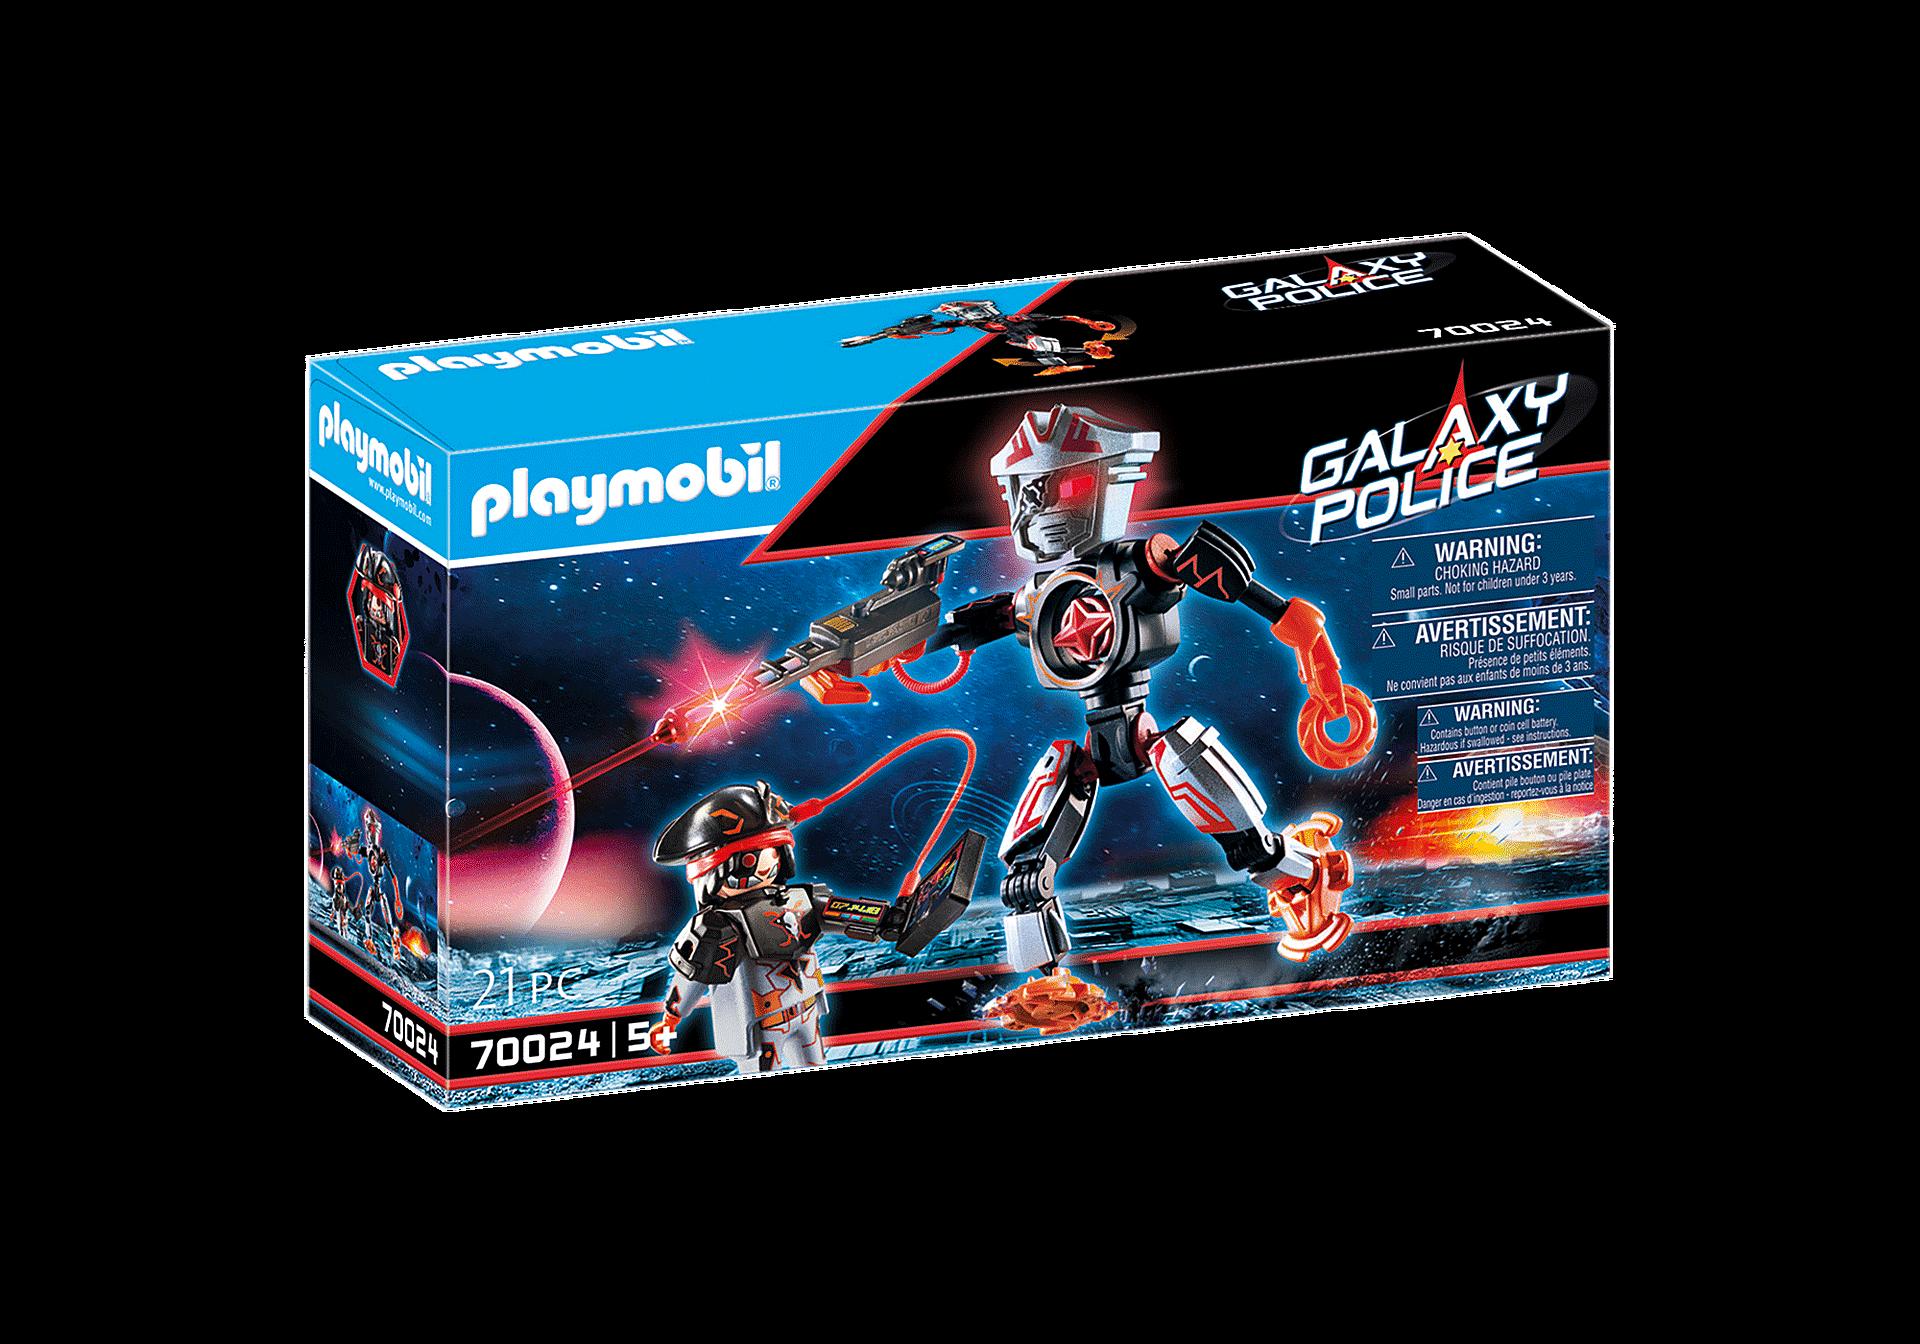 Playmobil - Galaxy Police - Space Pirates Robot (70024)